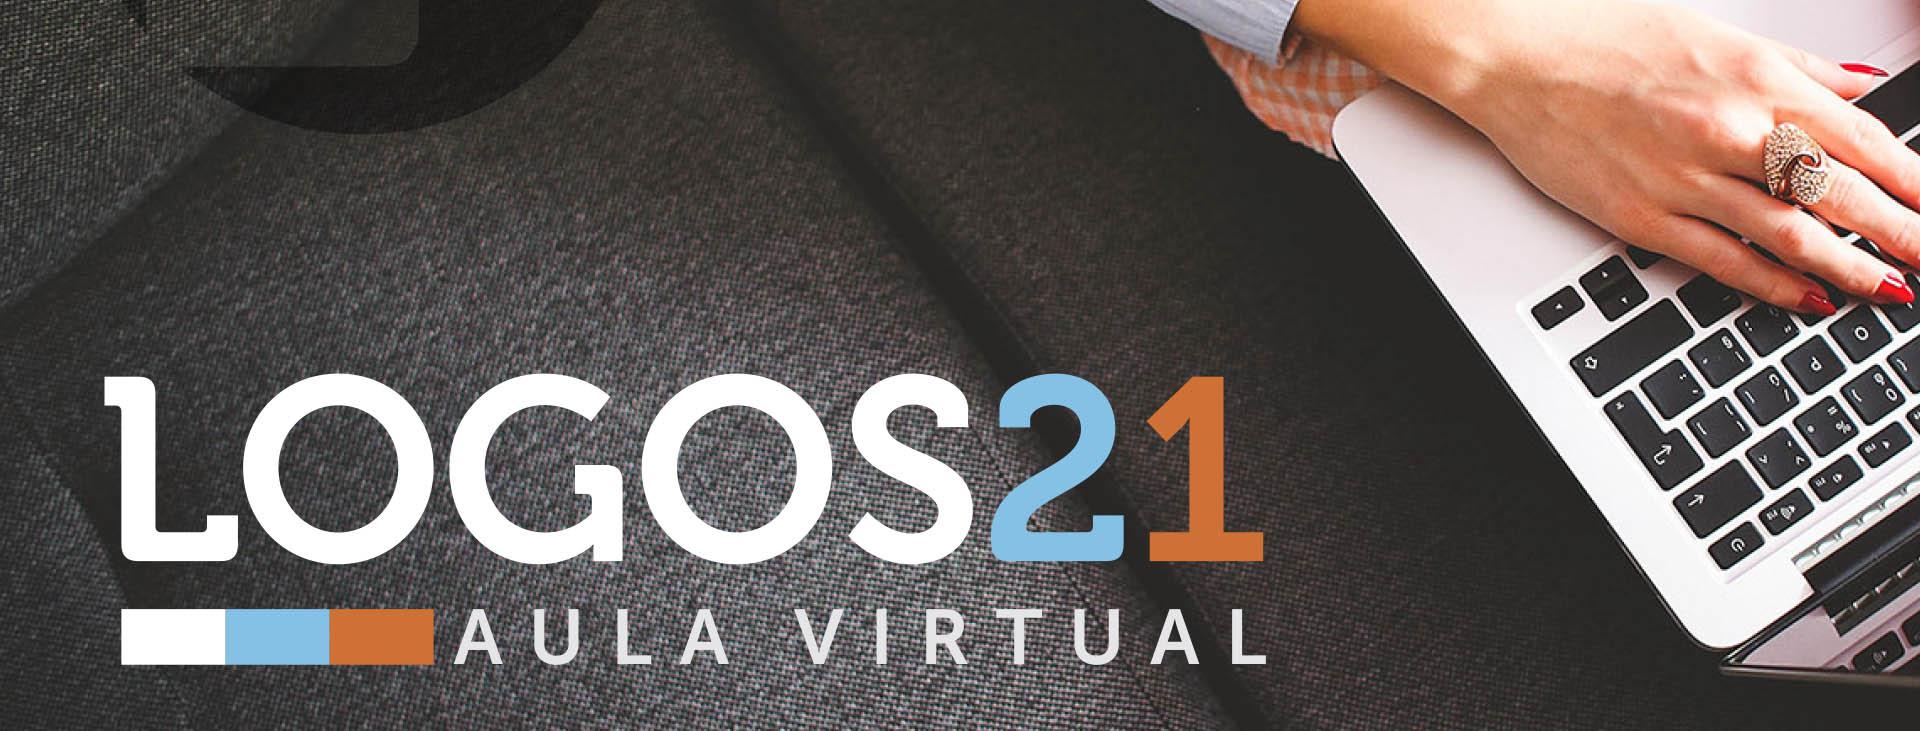 Acceso Aula Virtual